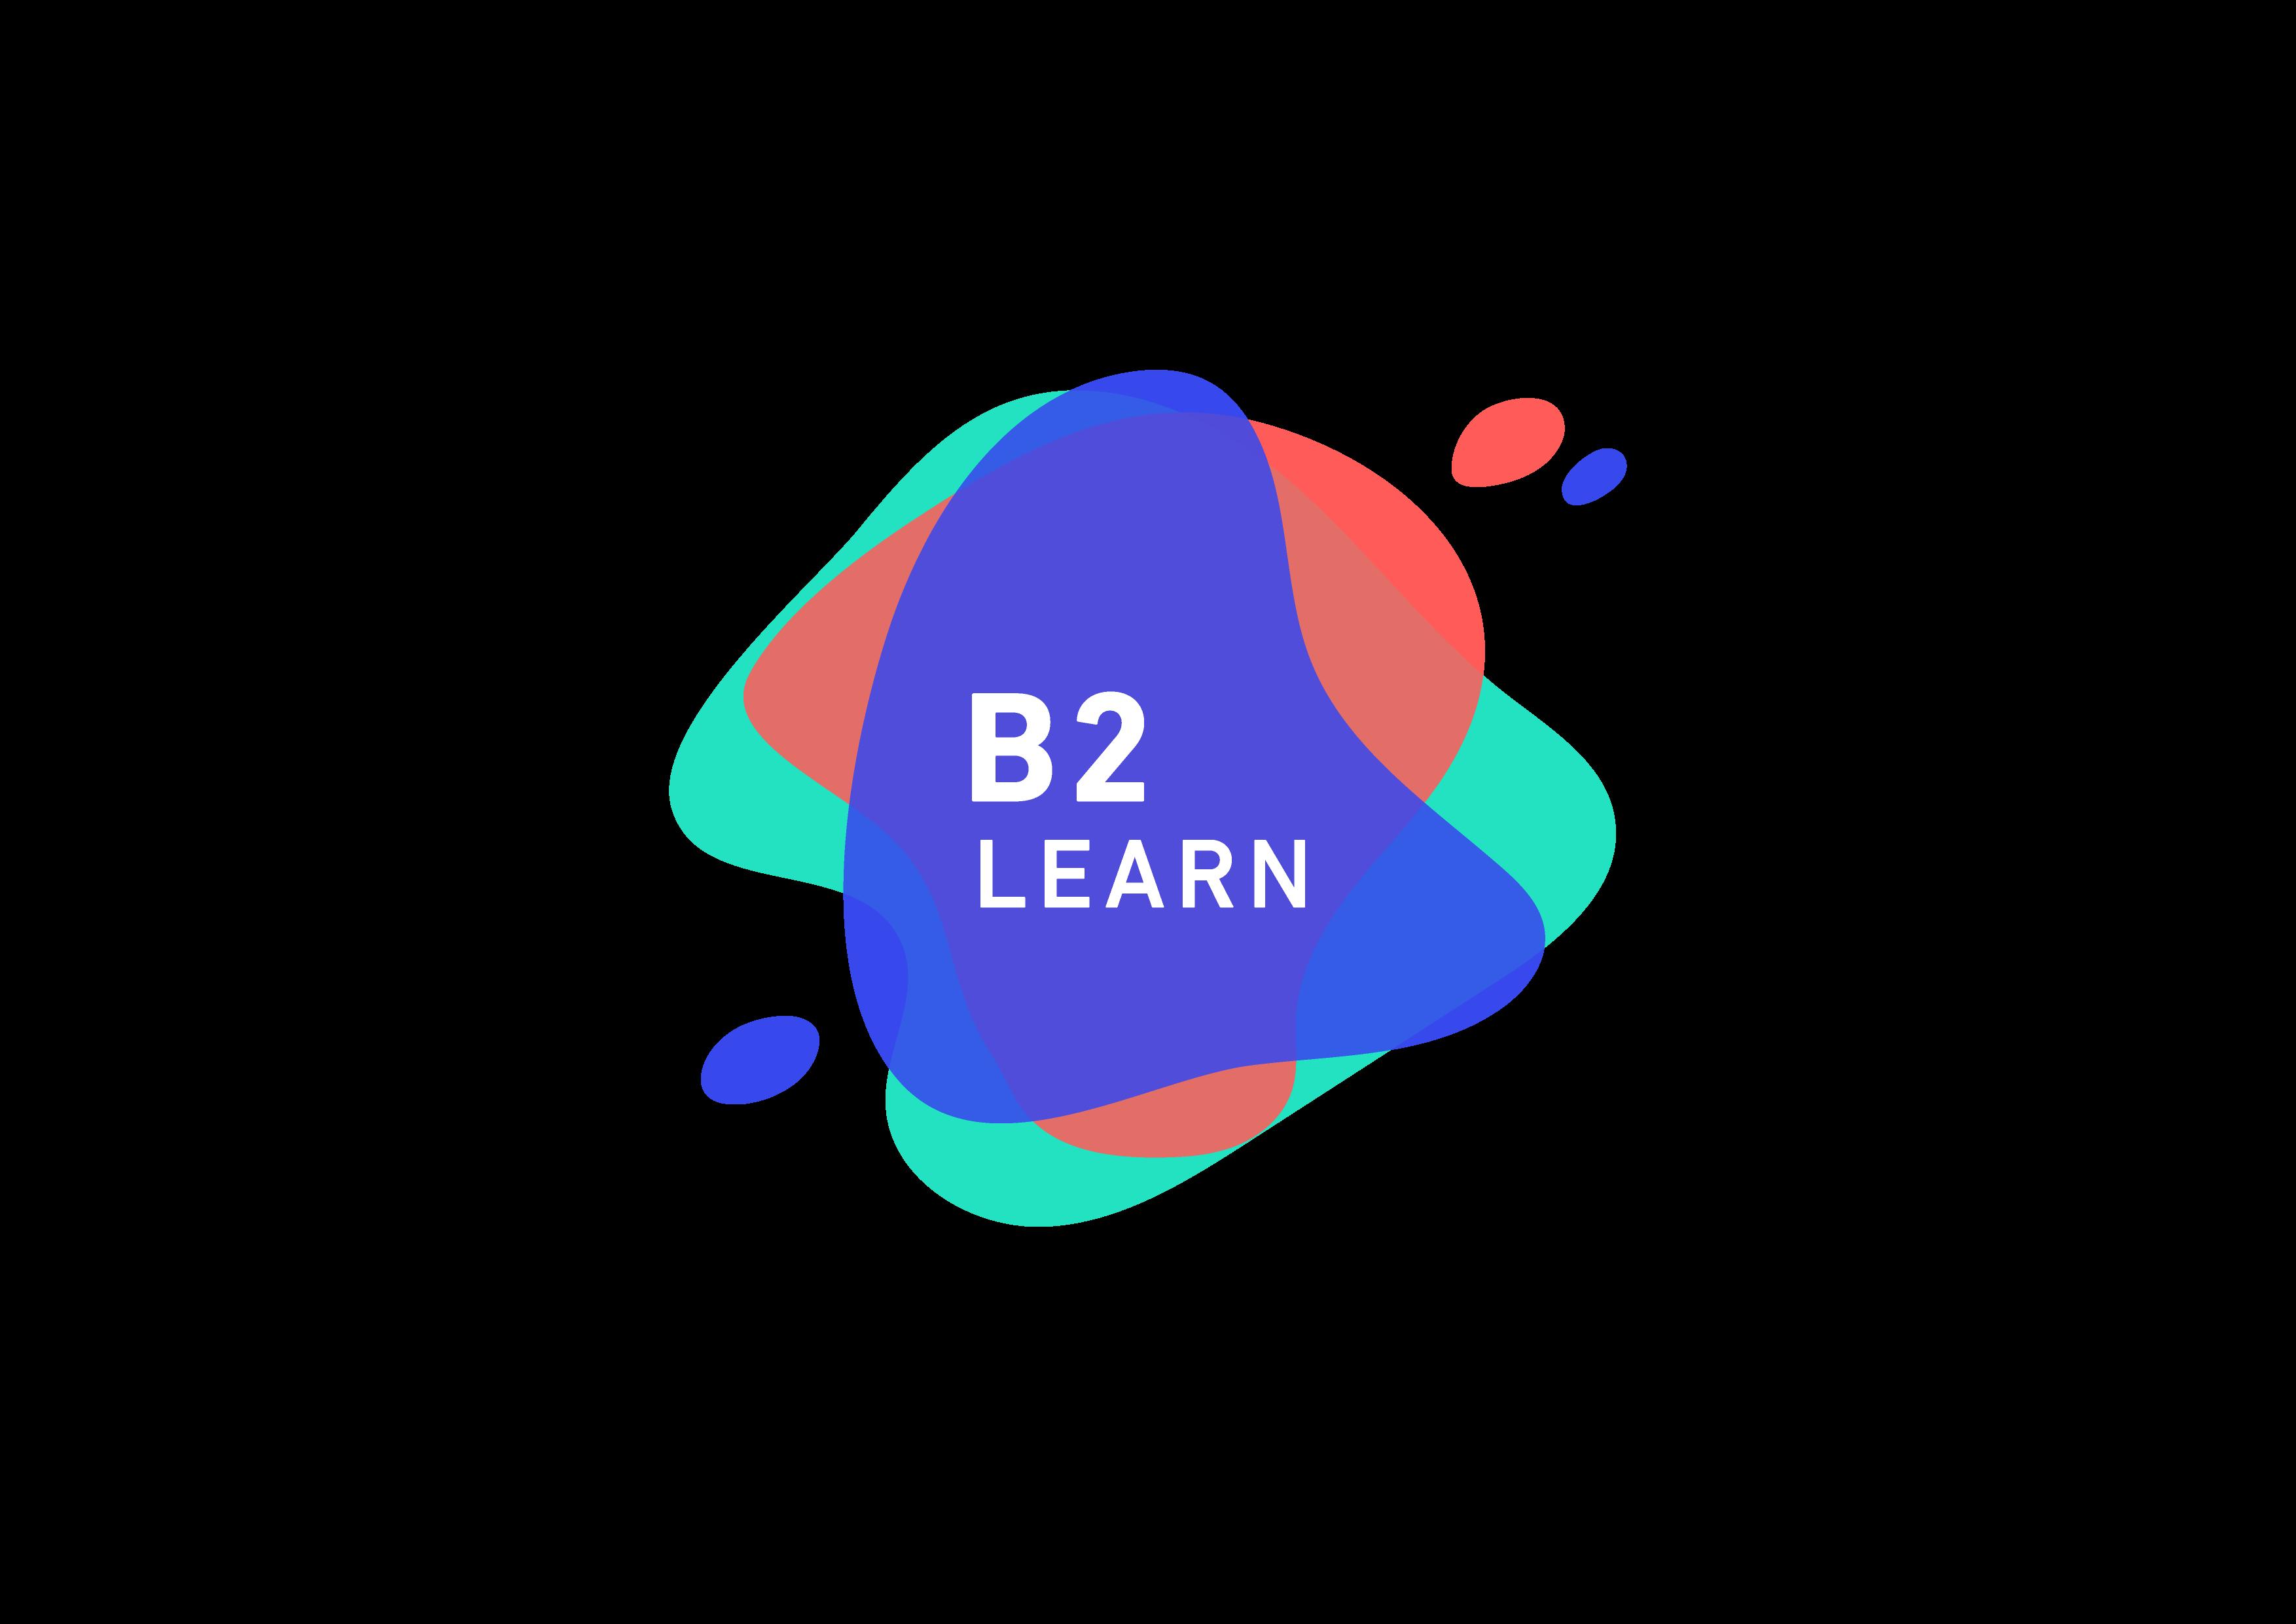 LOGO B2 LEARN